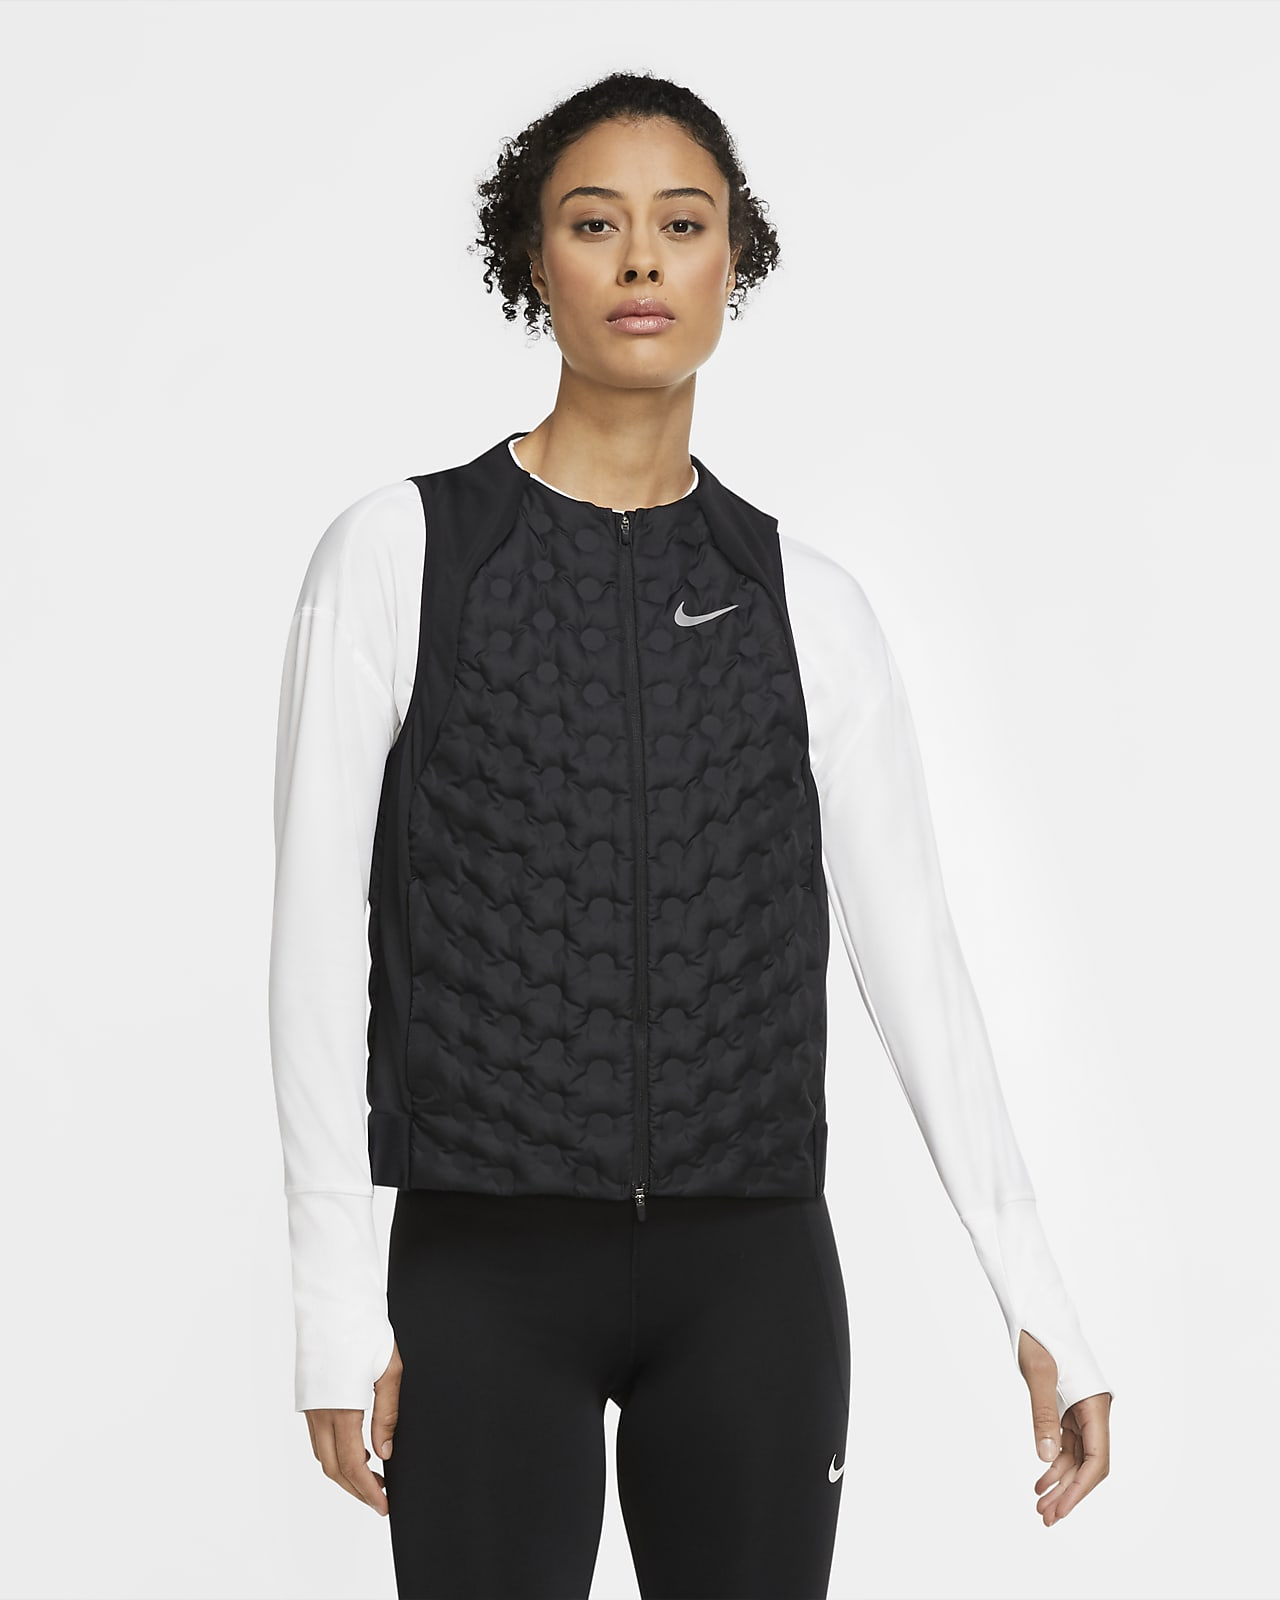 Nike AeroLoft løpevest til dame